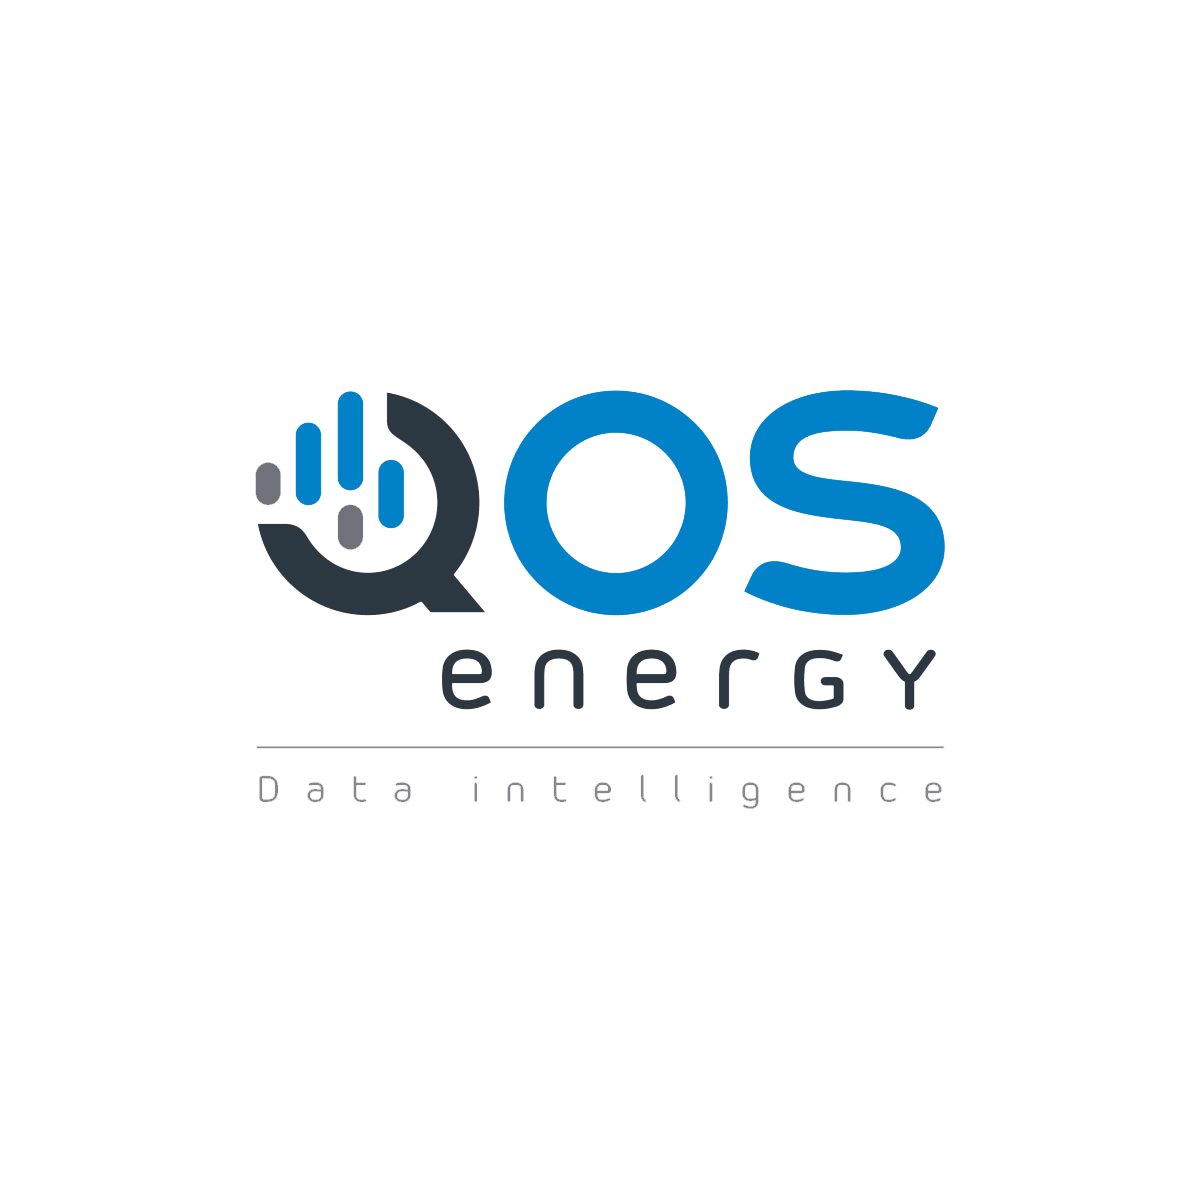 Logo-QOS-Energy-RVB-1200x1200-min